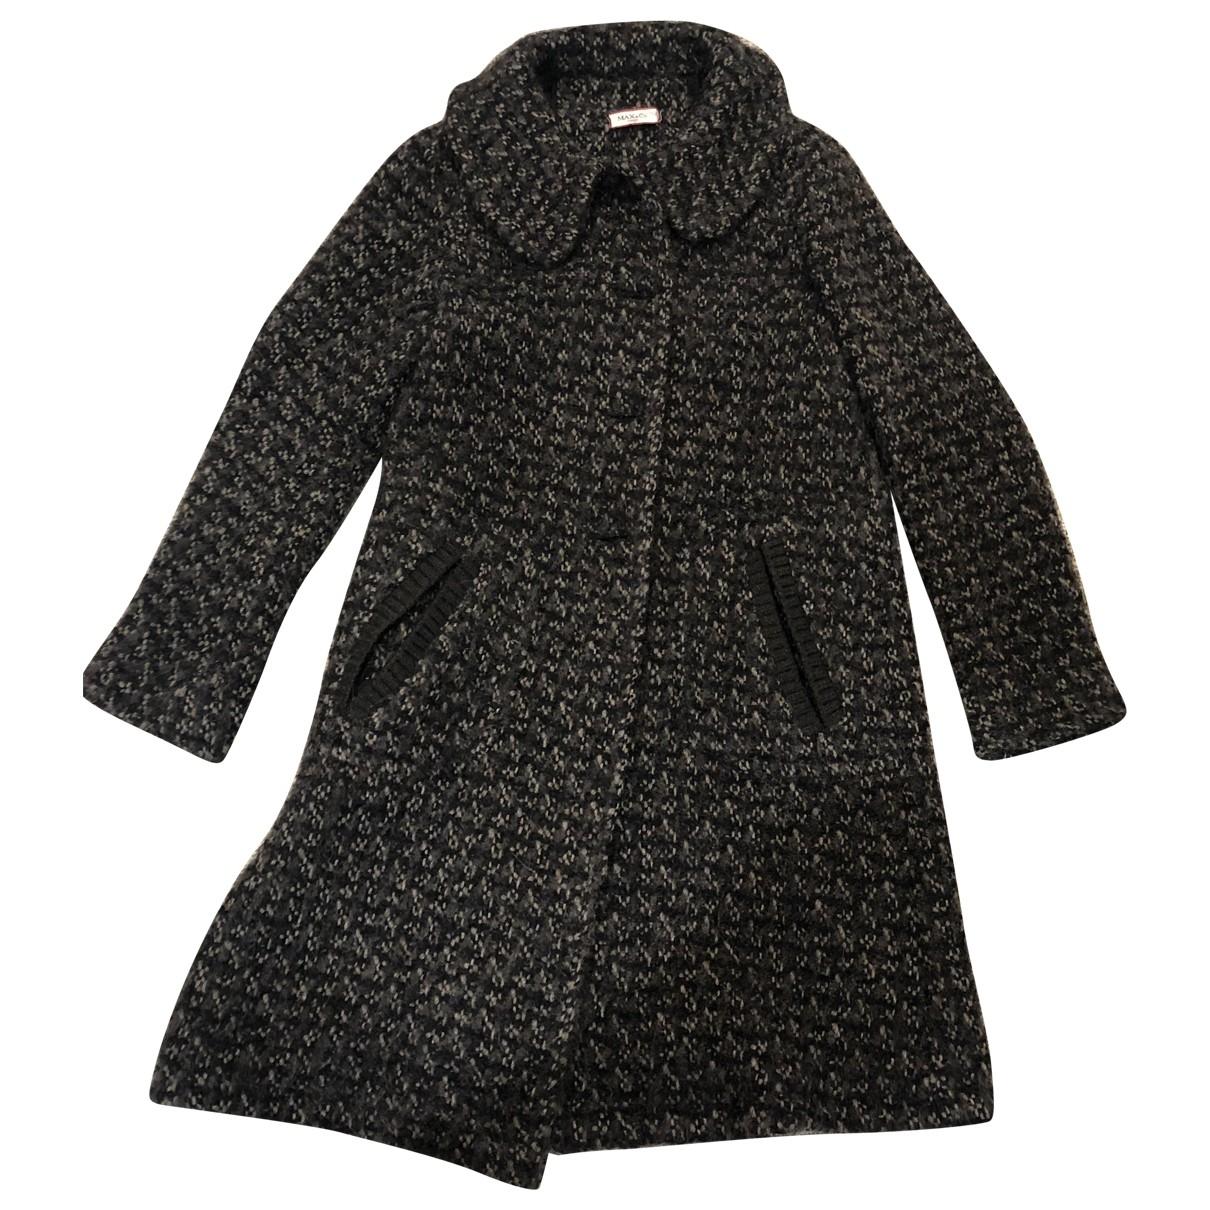 Max & Co \N Multicolour Wool coat for Women 36 FR